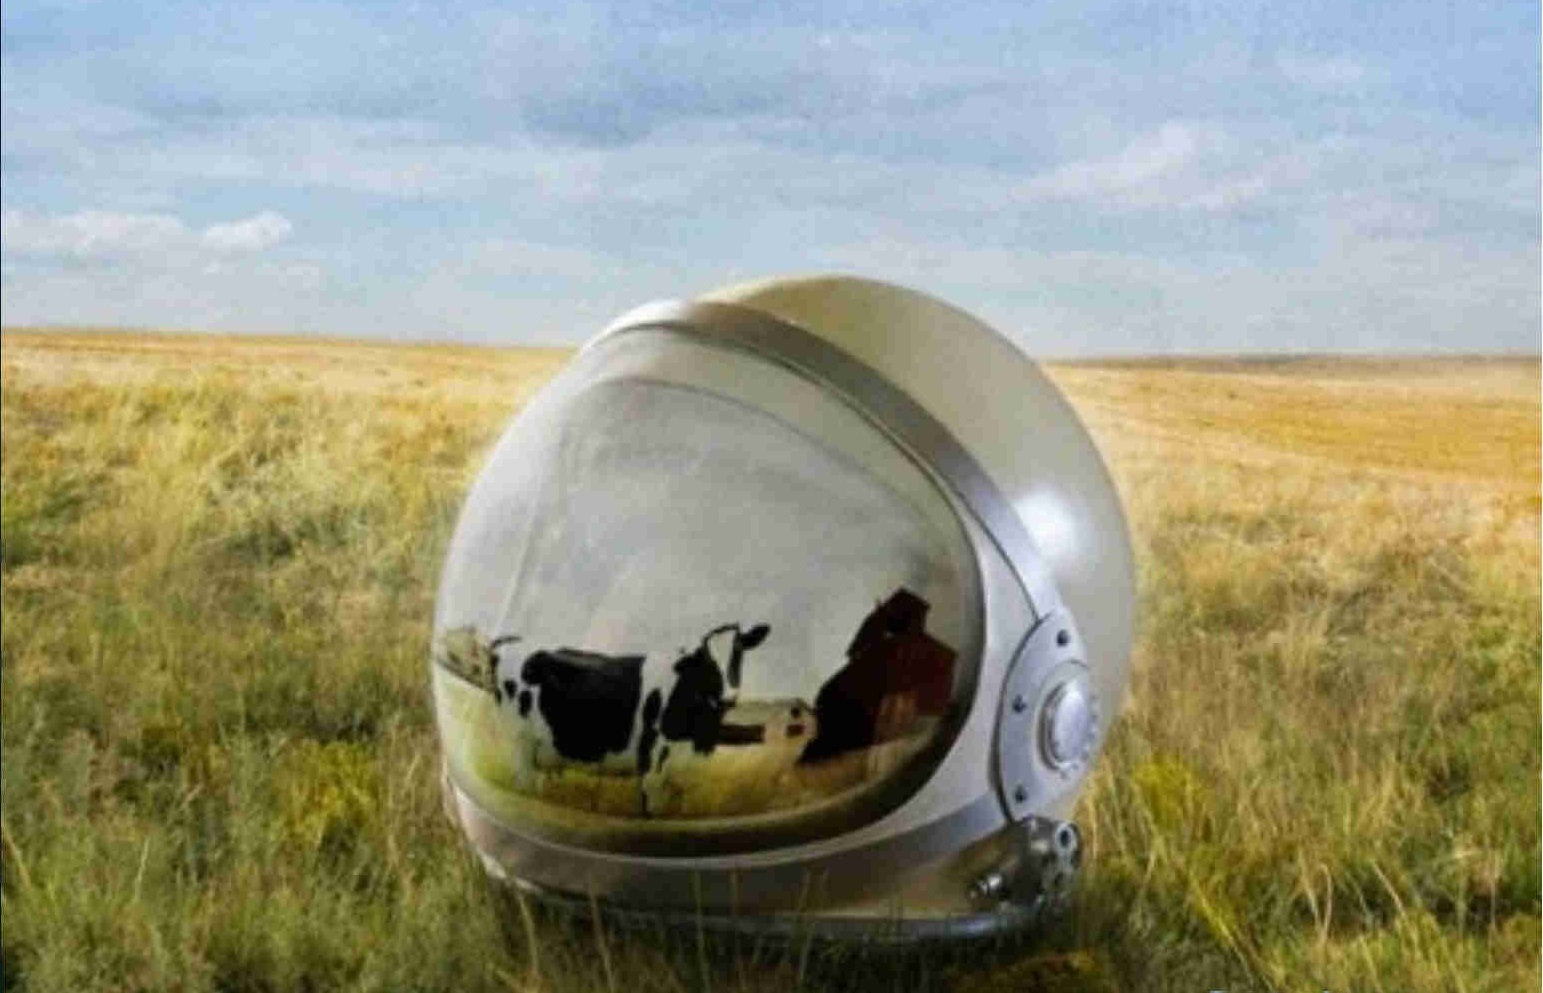 spacex farmer job astronaut